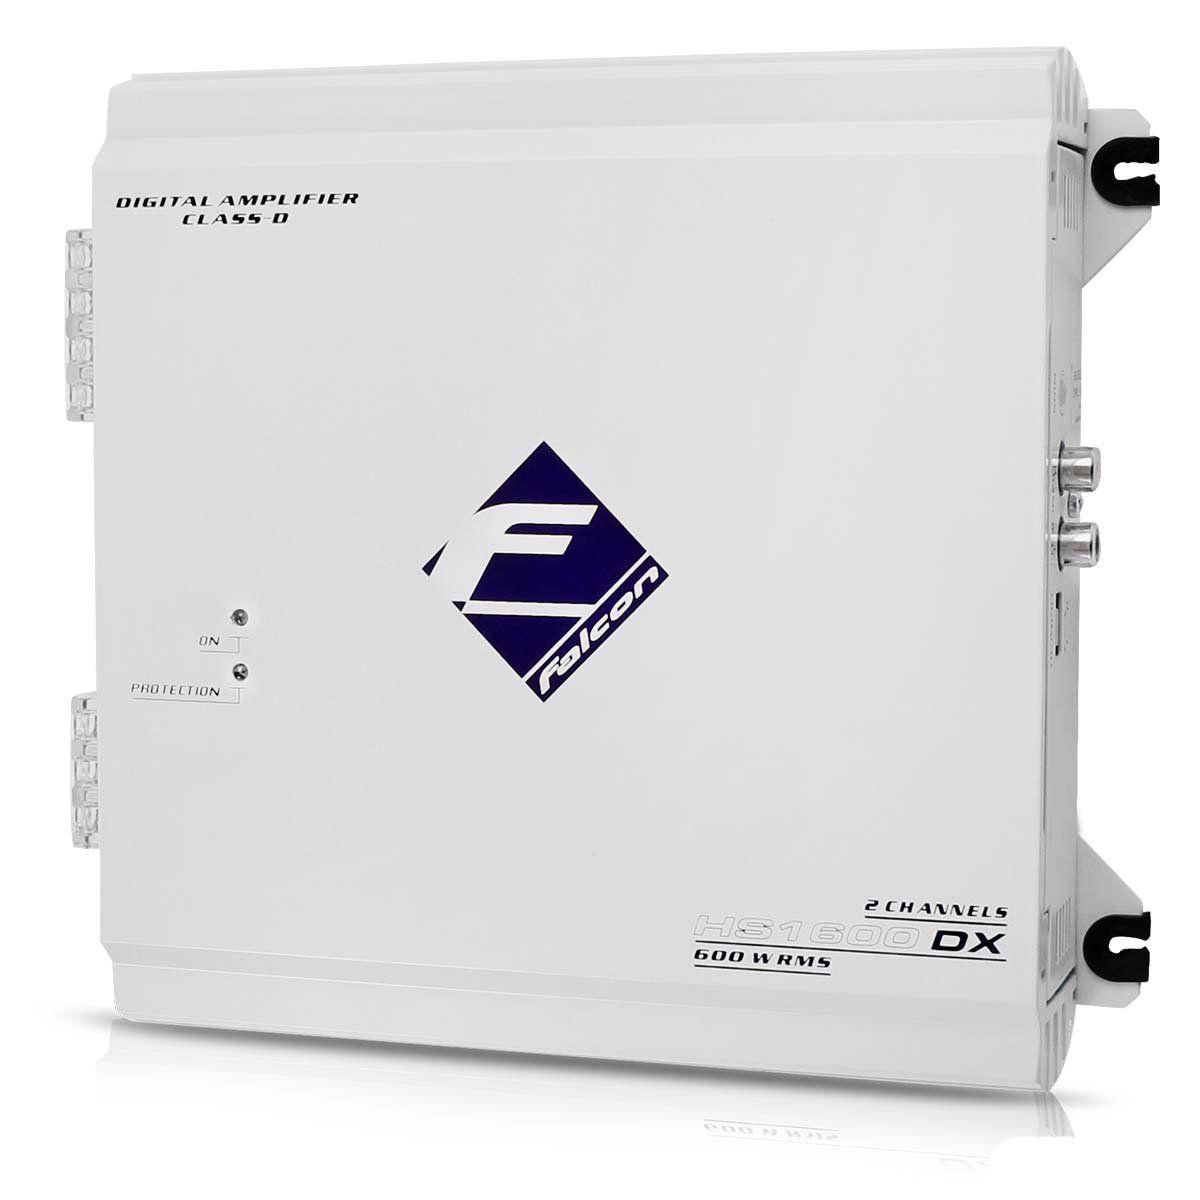 Módulo Amplificador Falcon Hs1600 Dx Digital 600w Rms 2 Can